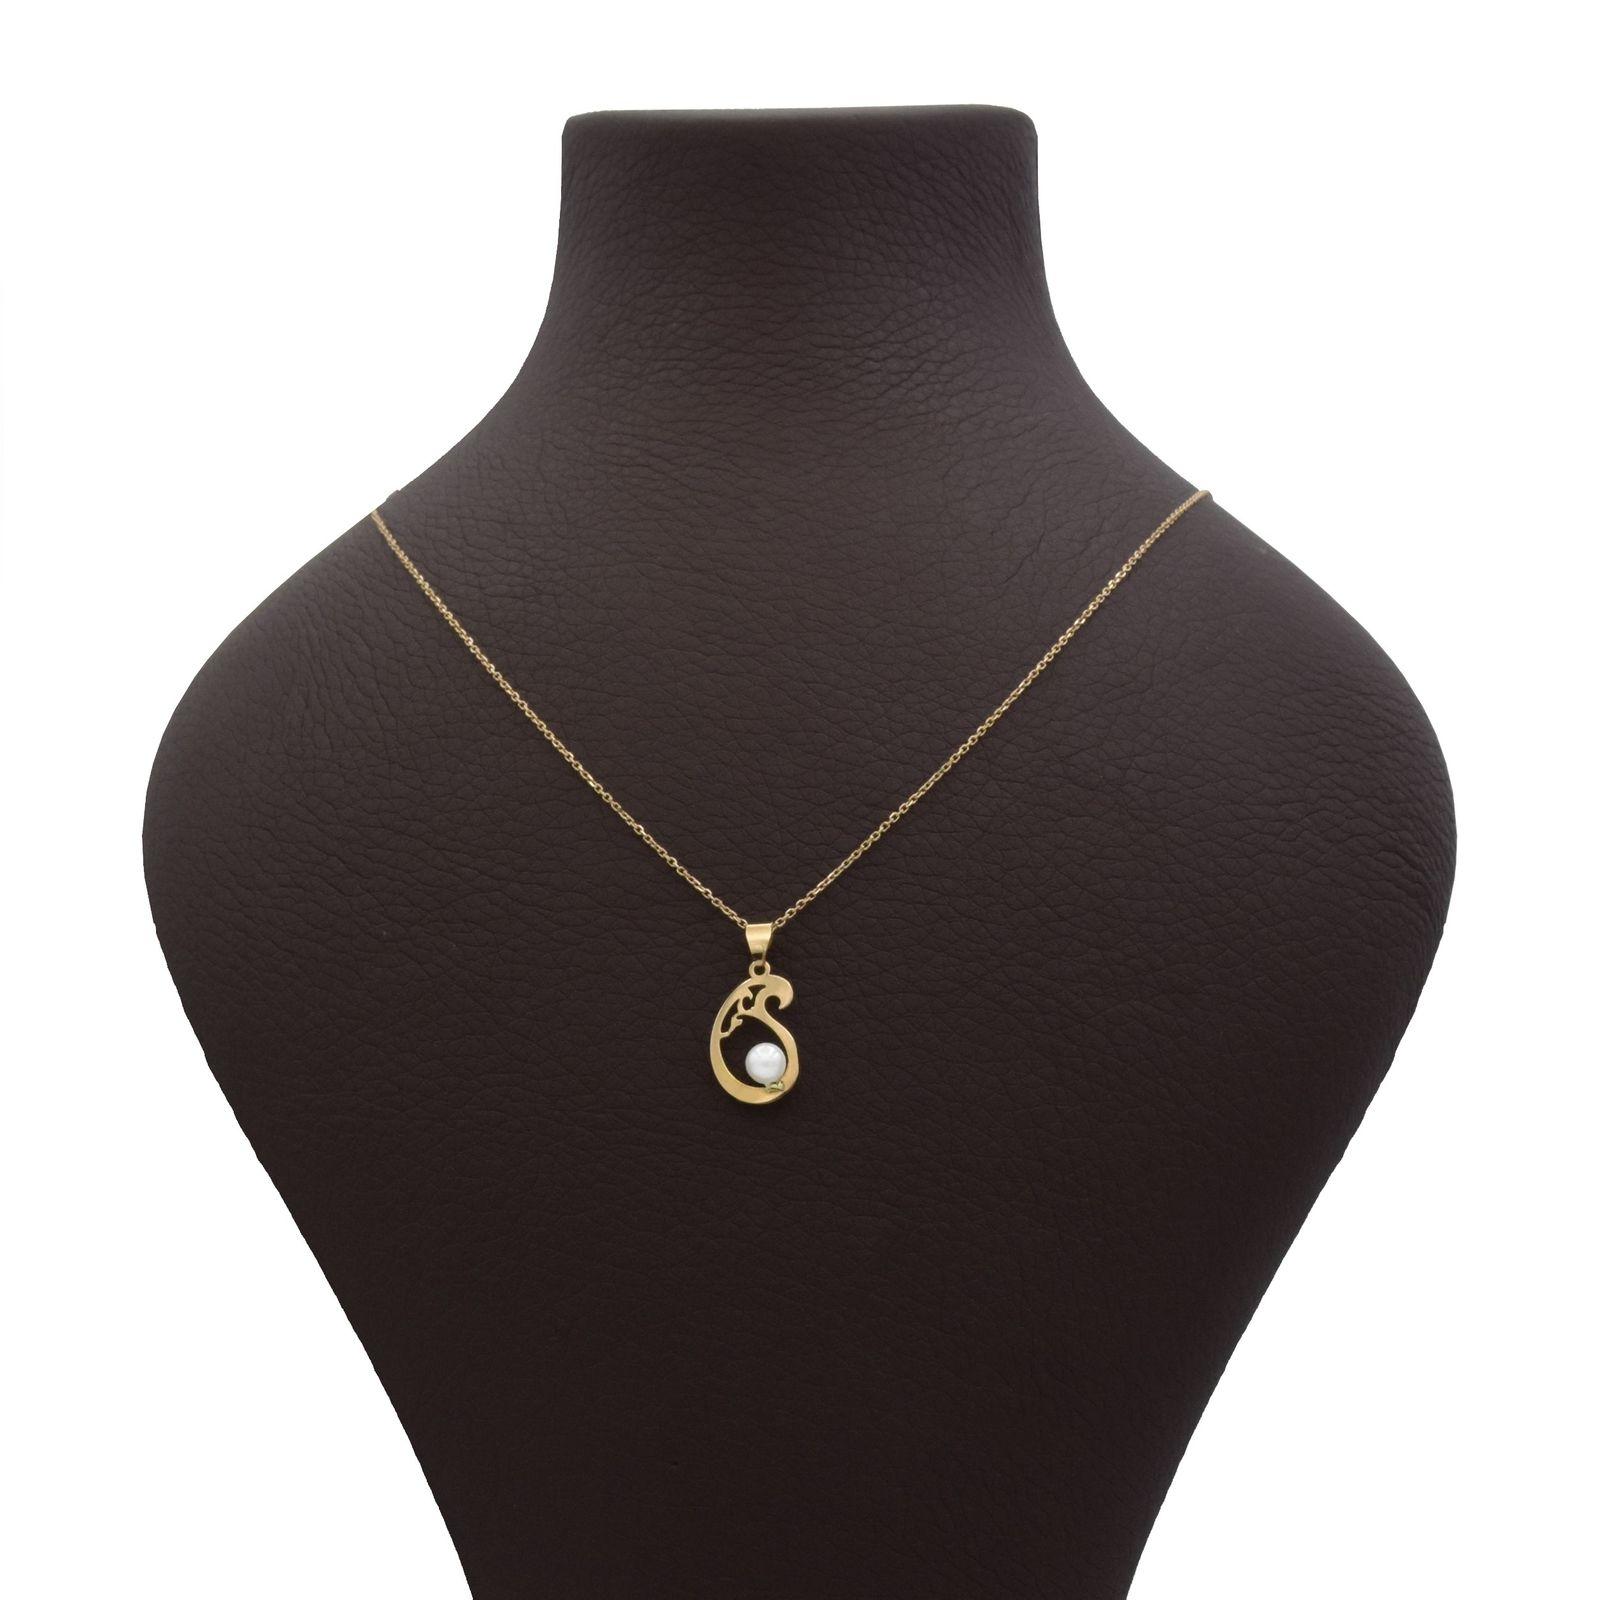 گردنبند طلا 18 عیار زنانه آمانژ طرح بته کد 1007D8952 -  - 2